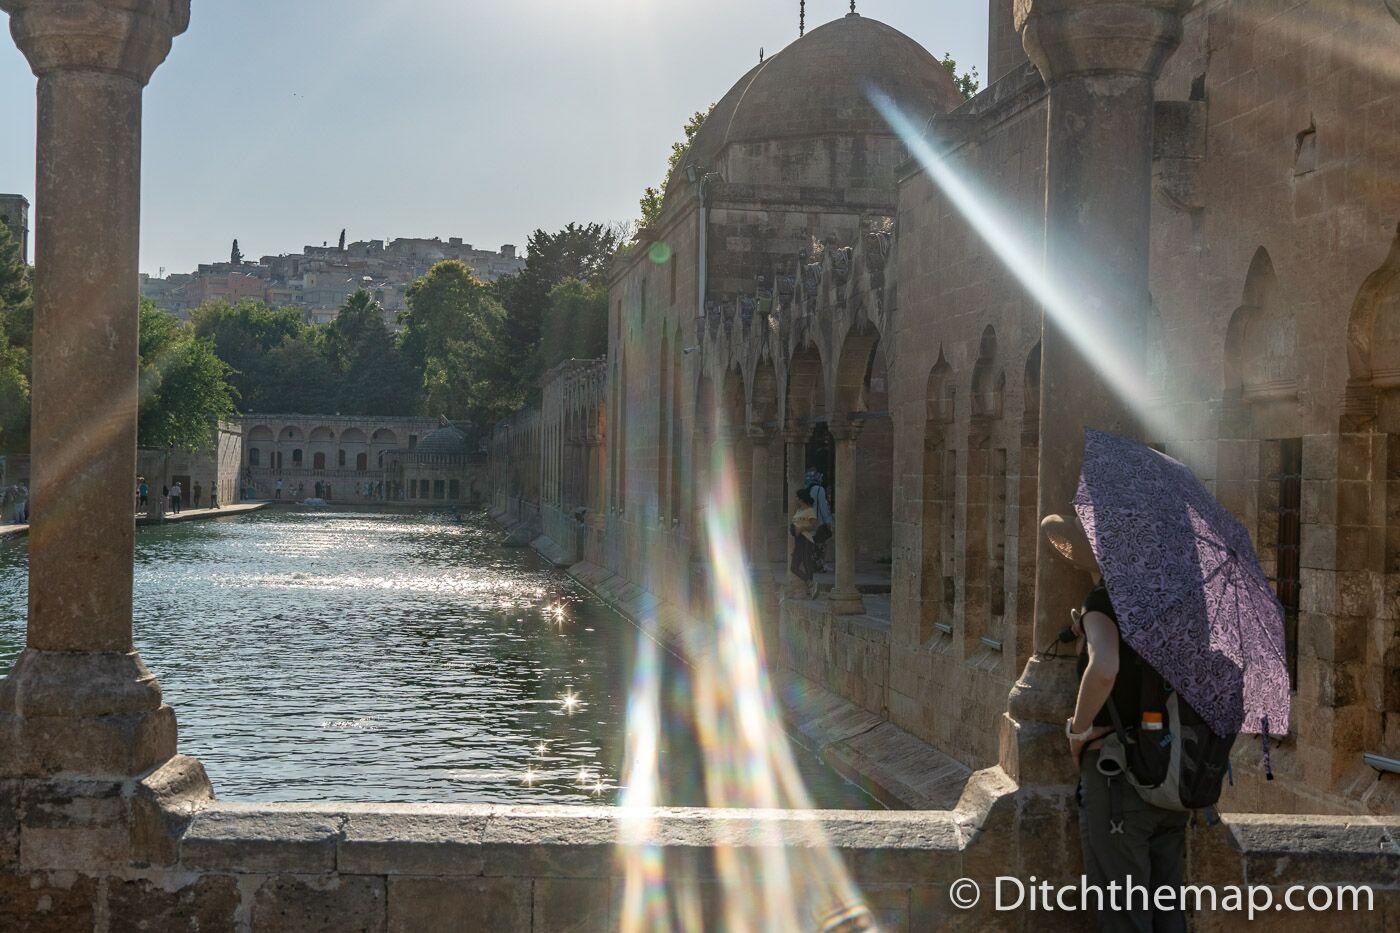 The pool of Abraham in Sanliurfa, Turkey